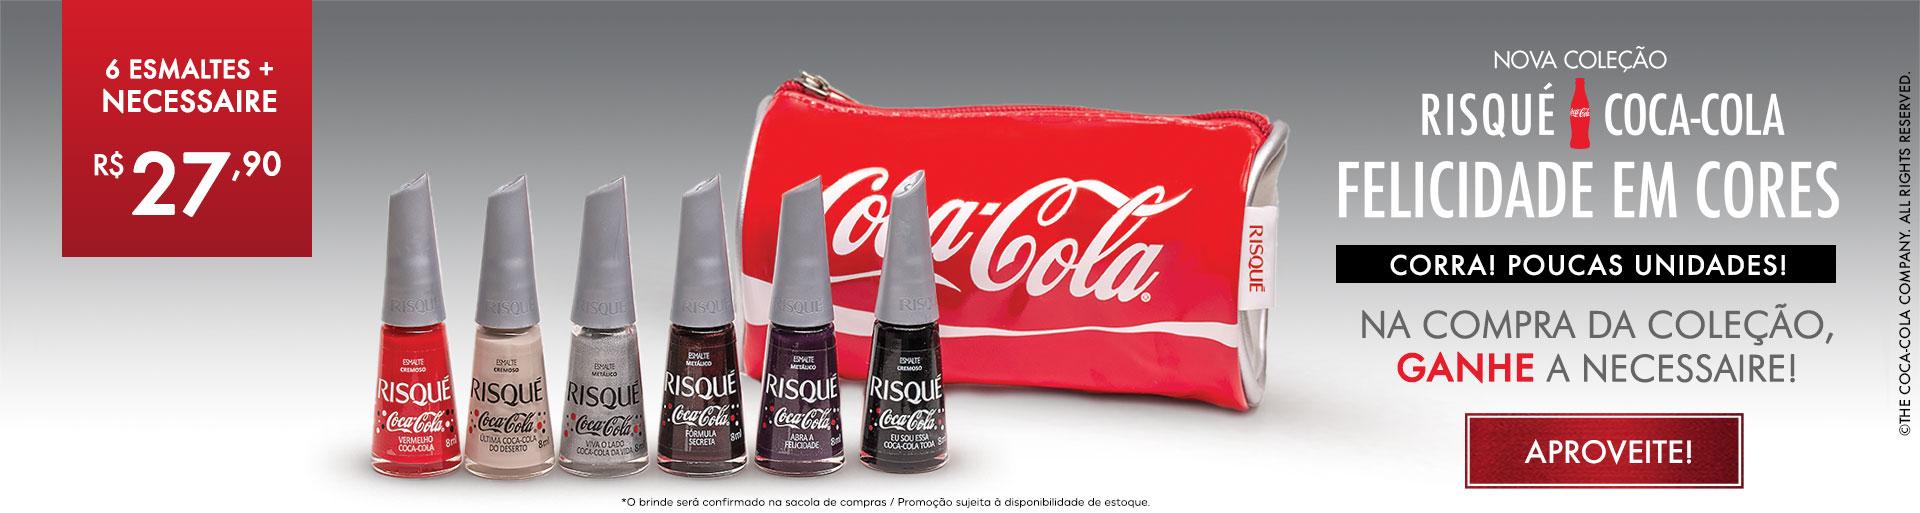 Risqué Coca com brinde